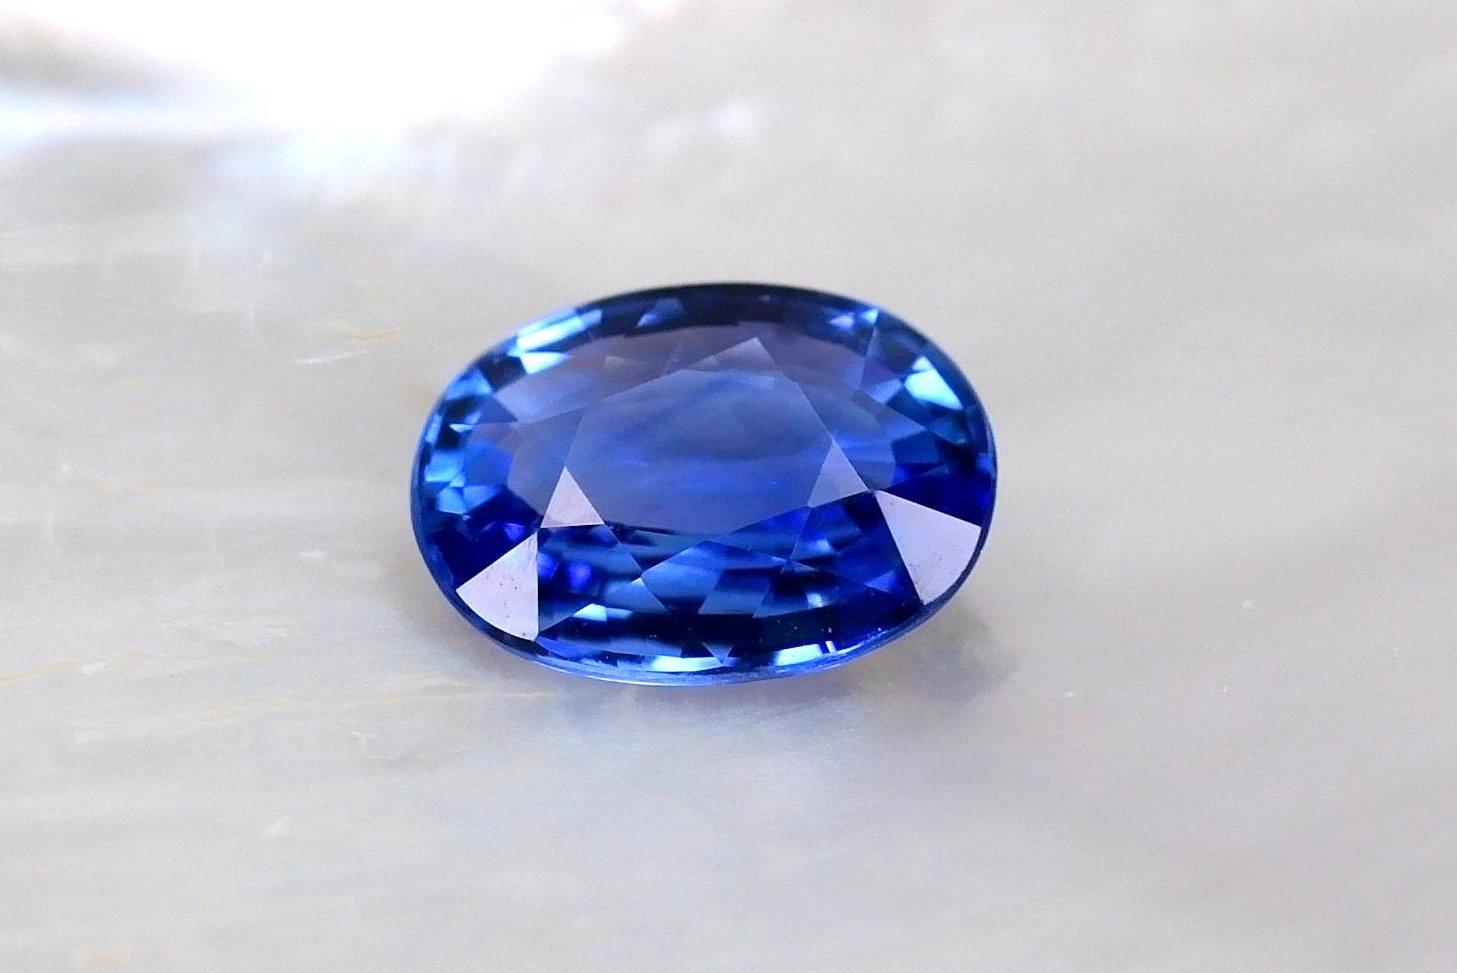 Grade AAA+ Vivid Blue Sapphire